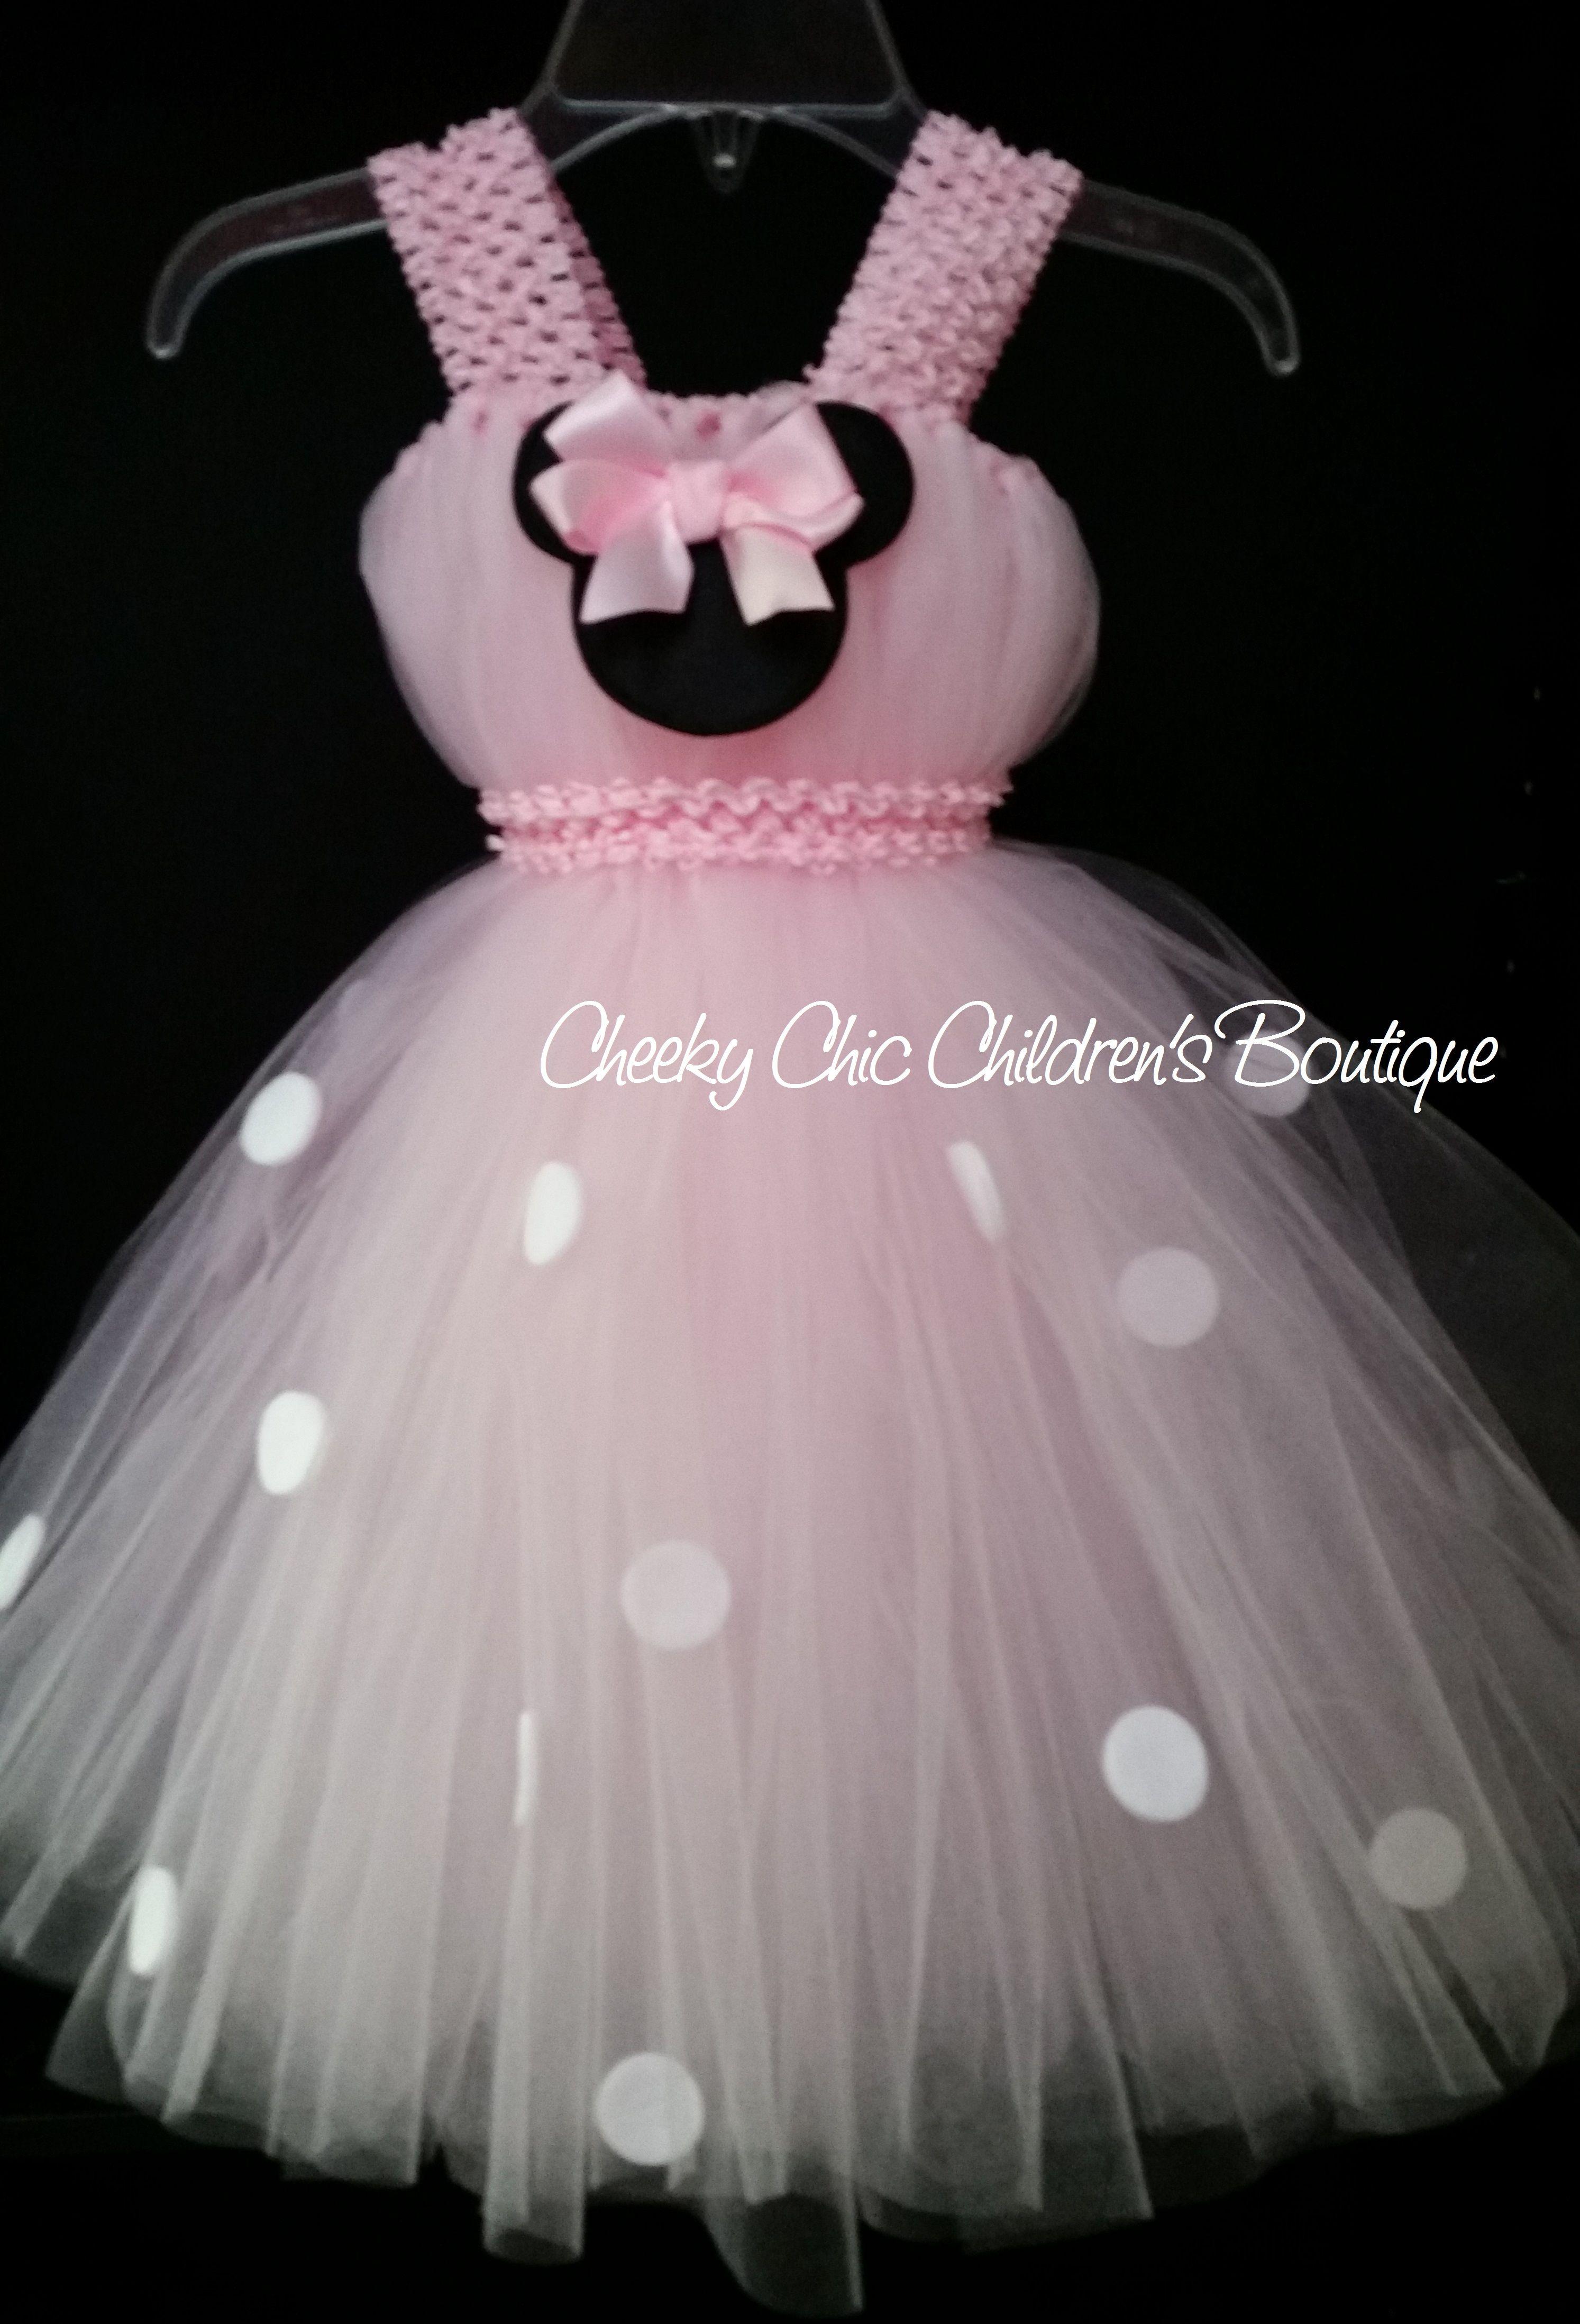 Baby pink Minnie Mouse tutu dress